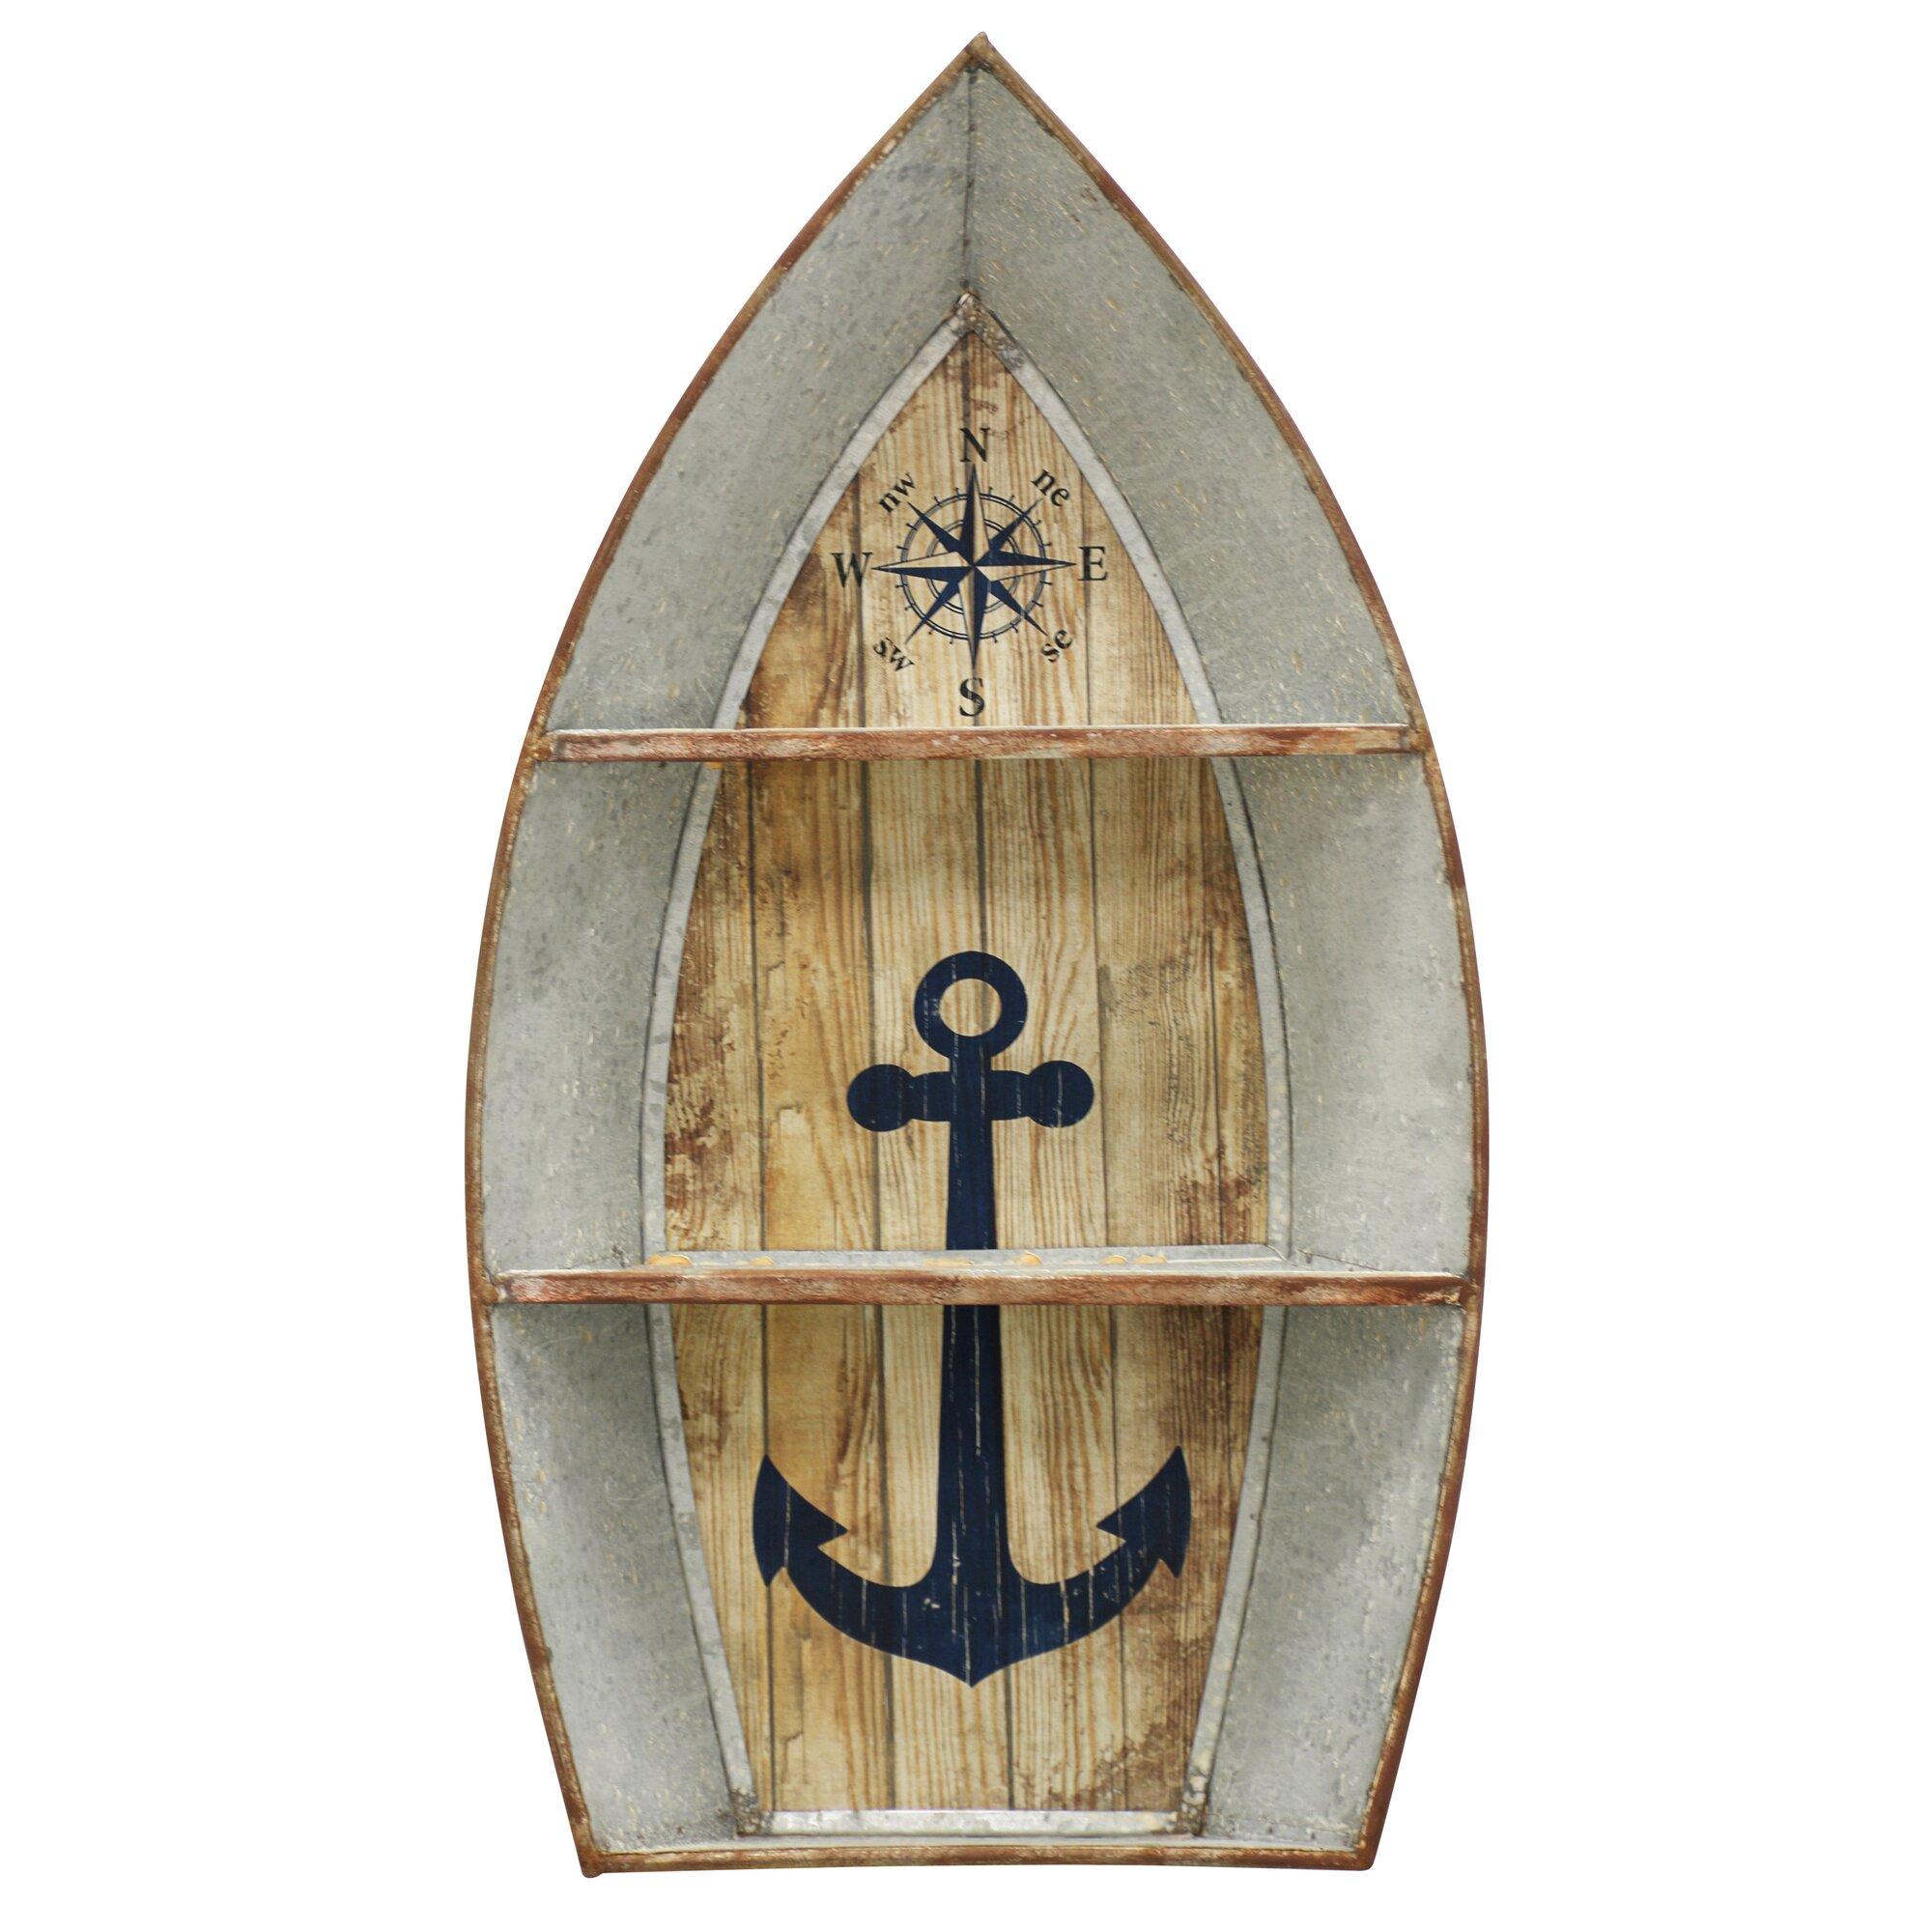 Nautical metal boat shelves wall decor amp reviews birch lane